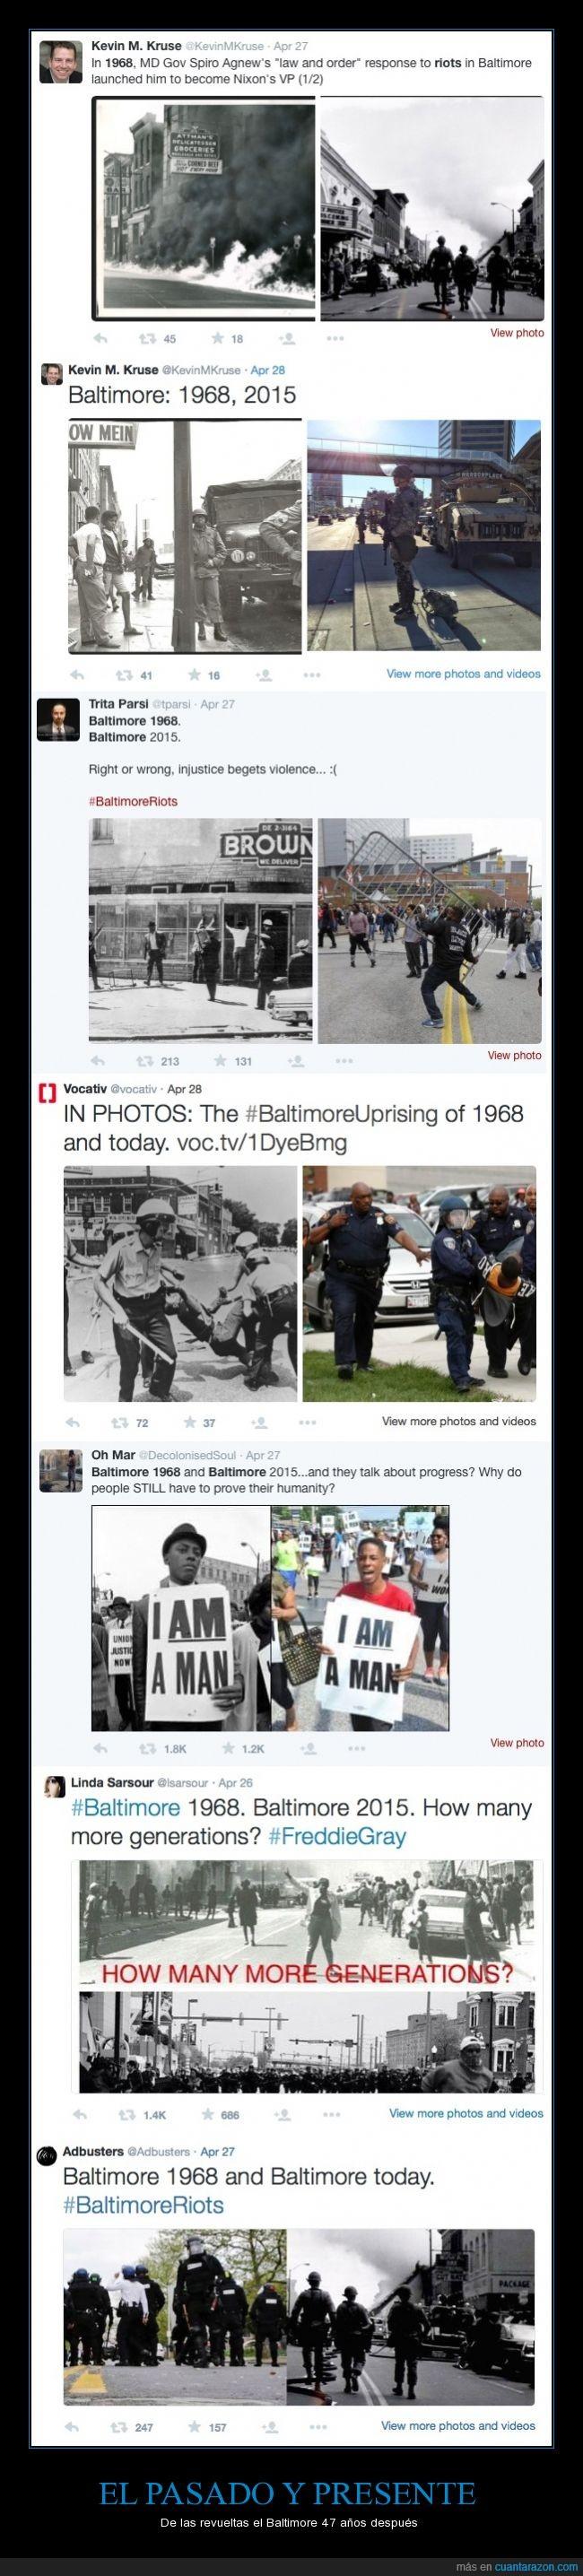 1968,2015,Baltimore,derechos,manifestacion,policia,racismo,revuelta,riot